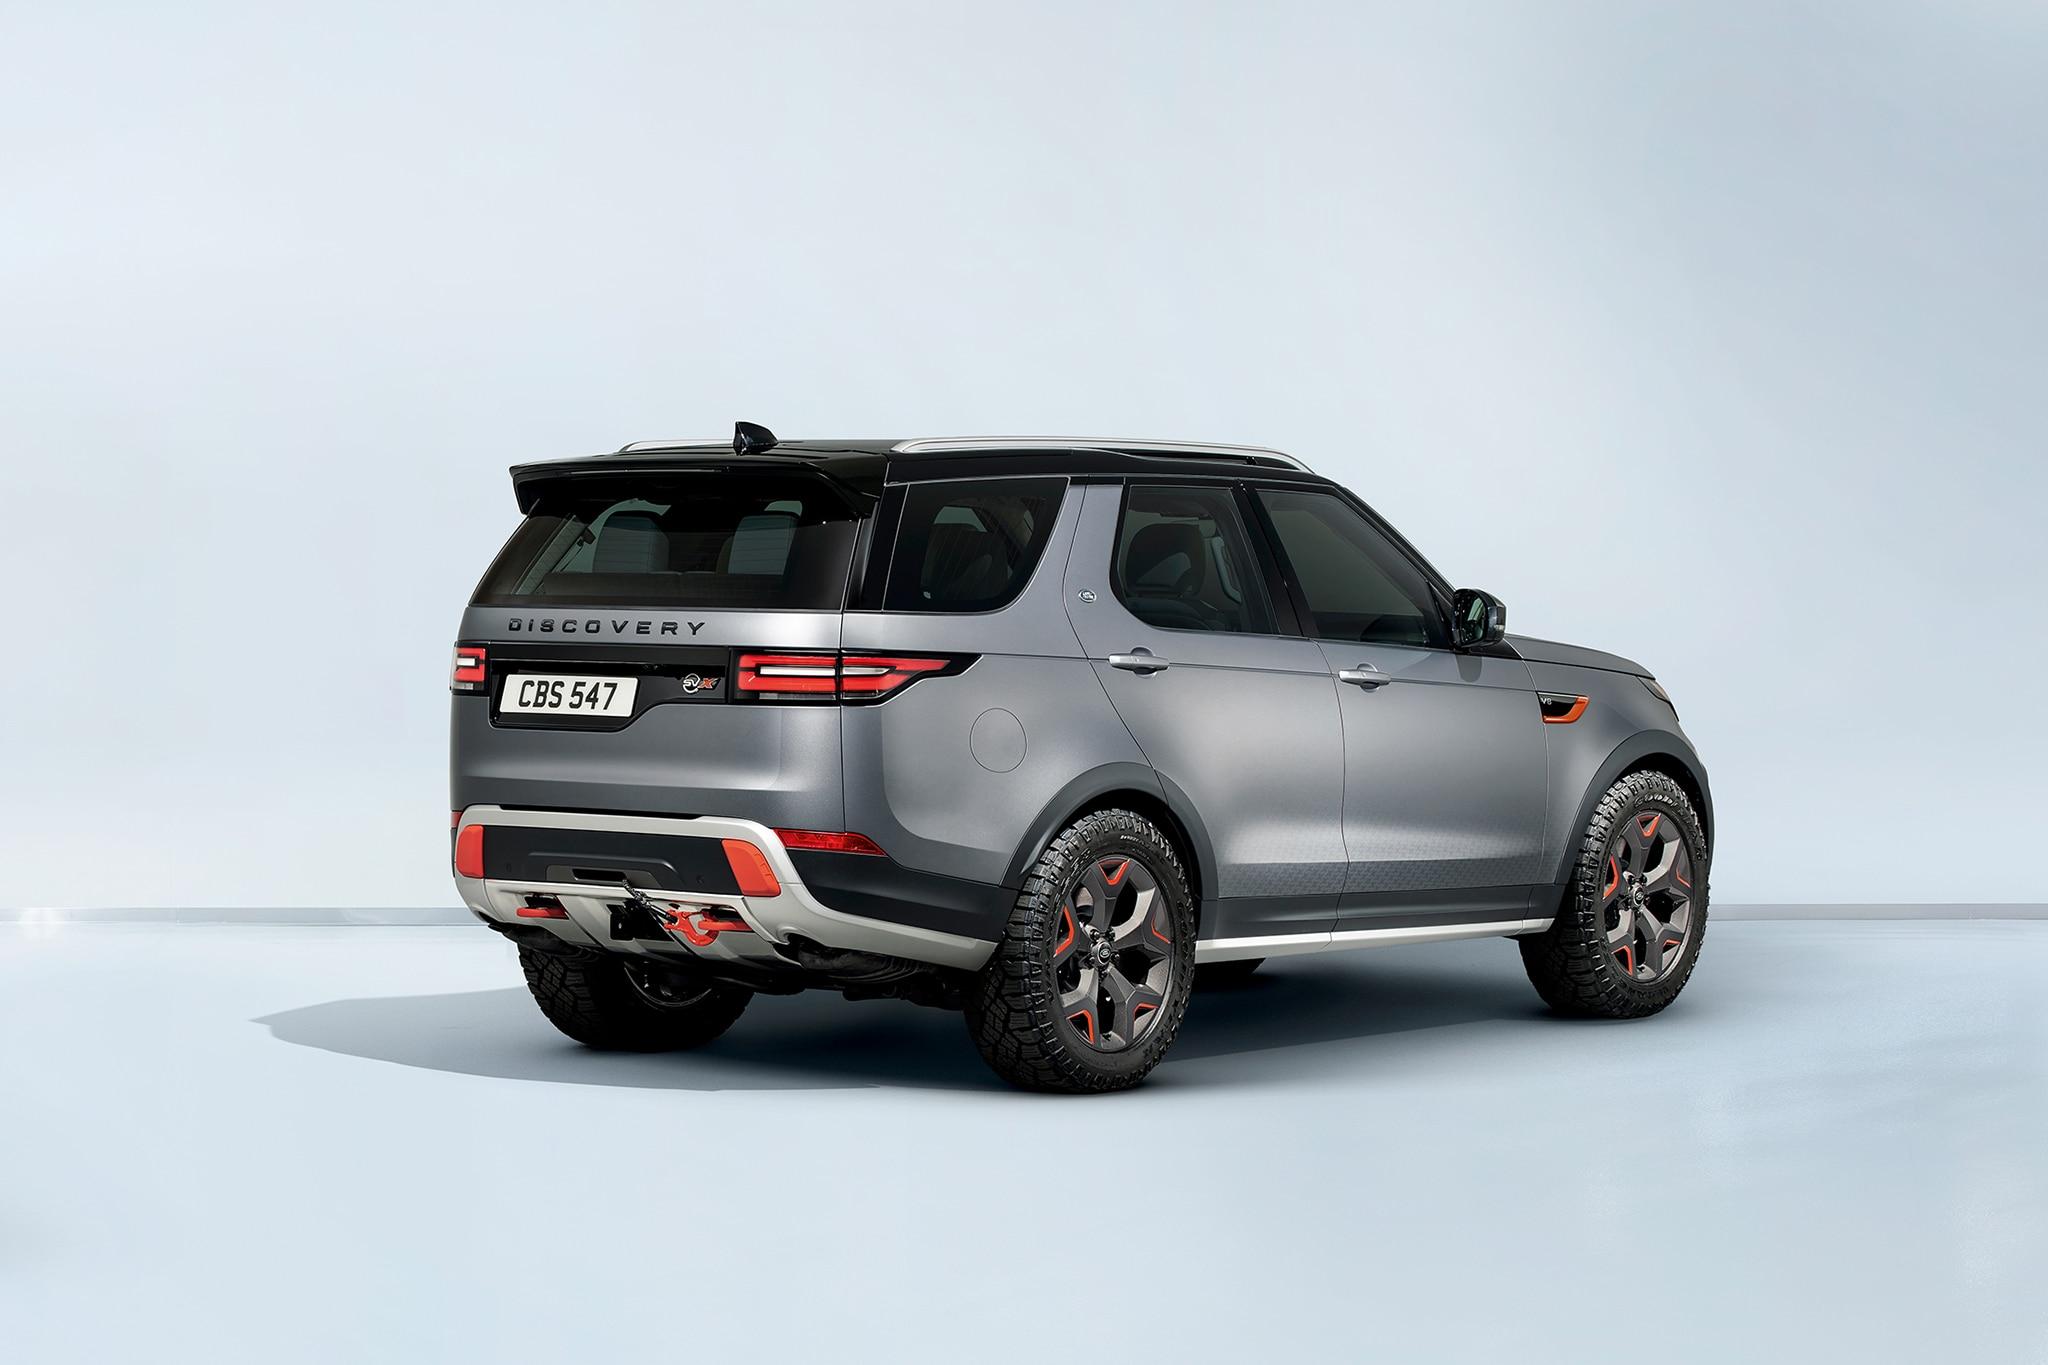 jaguar land rover to introduce more svx models says report automobile magazine. Black Bedroom Furniture Sets. Home Design Ideas